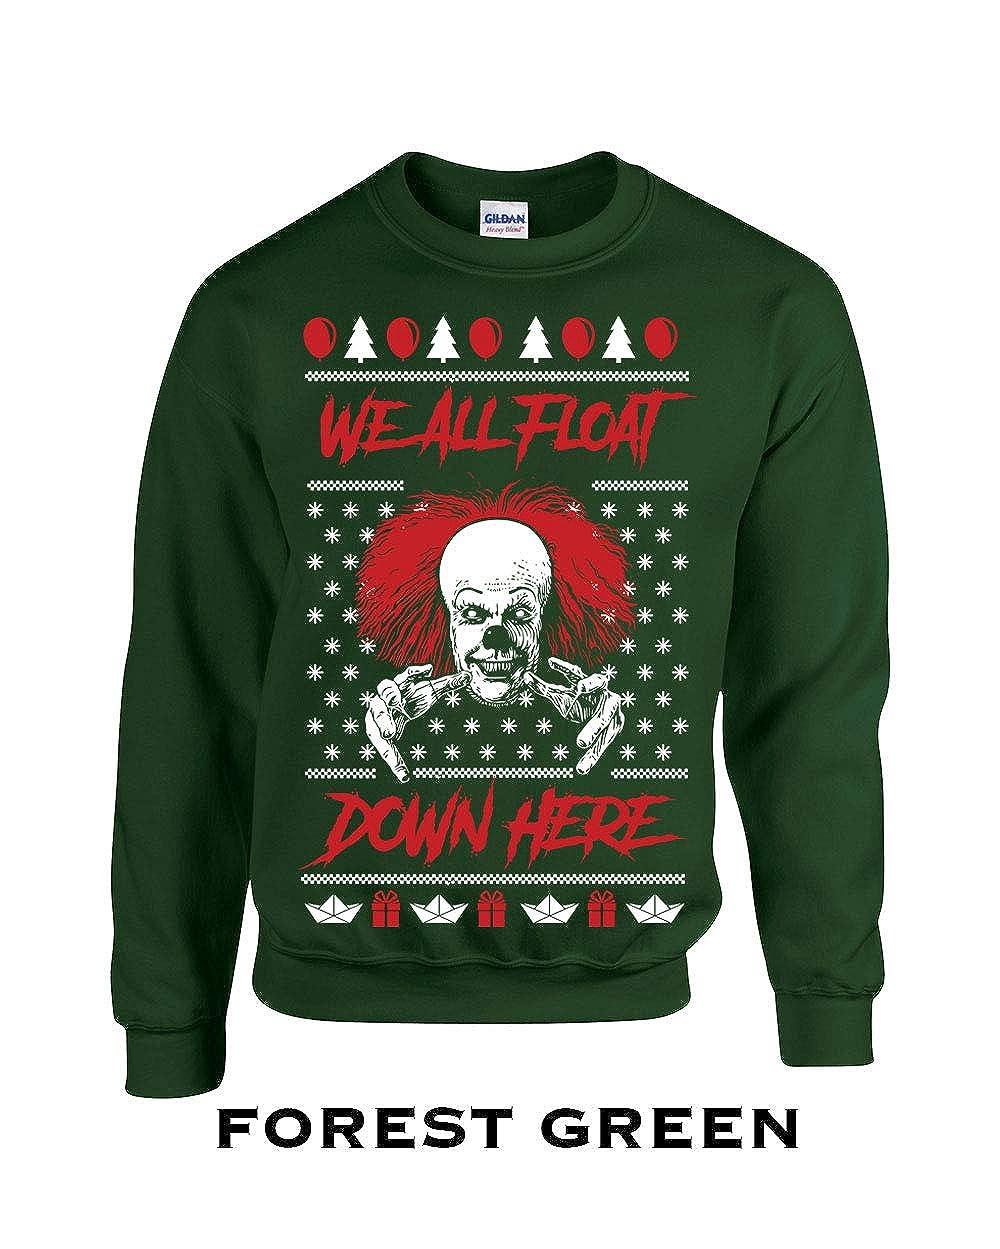 Swaffy Tees 648 We All Float Xmas Sweater Funny Adult Crew Sweatshirt